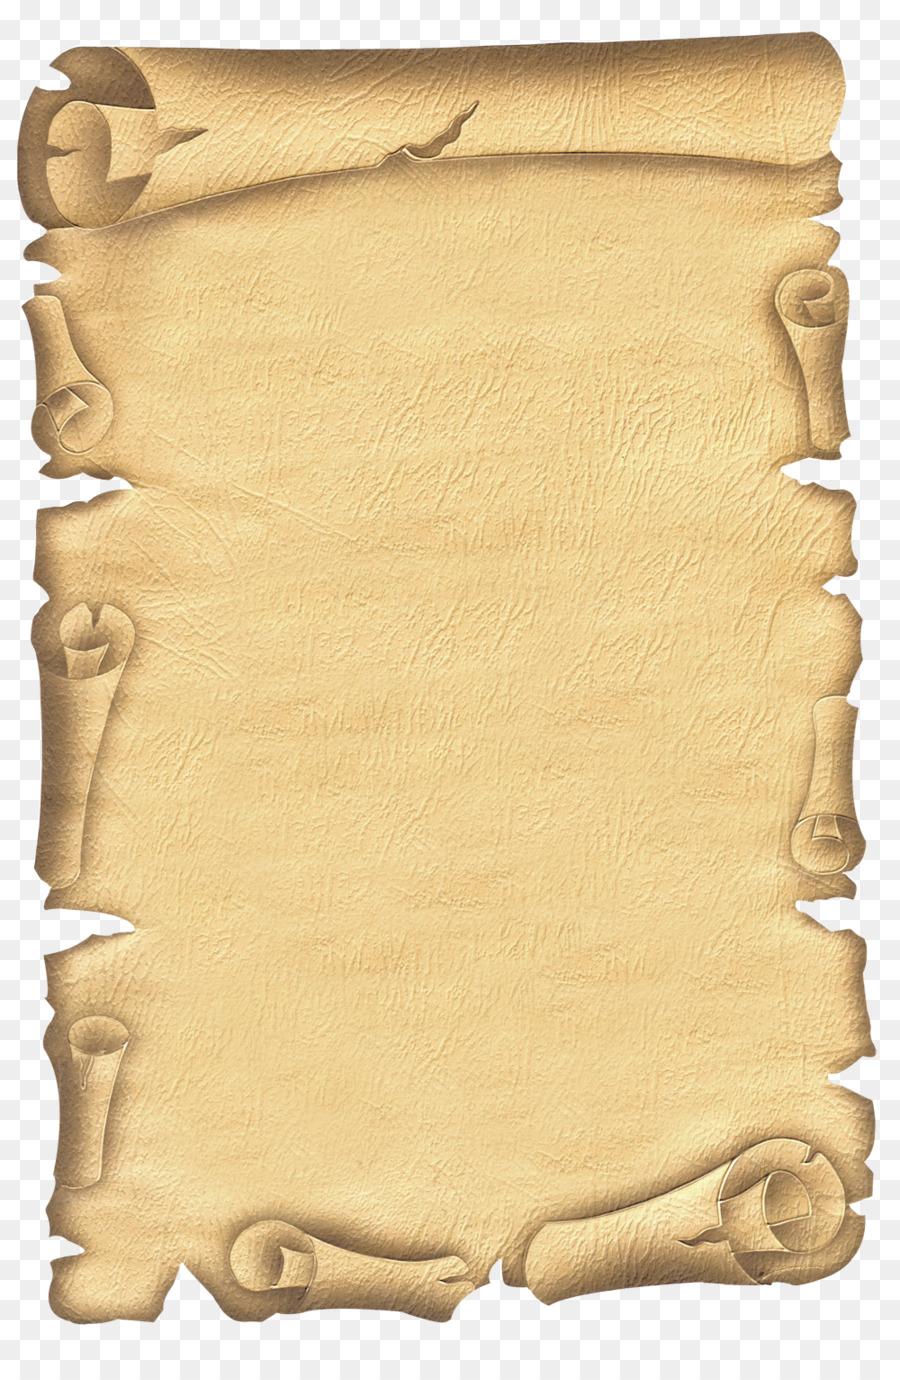 Desktop Wallpaper Papyrus Pergament Geschichte Des Papiers Bankett